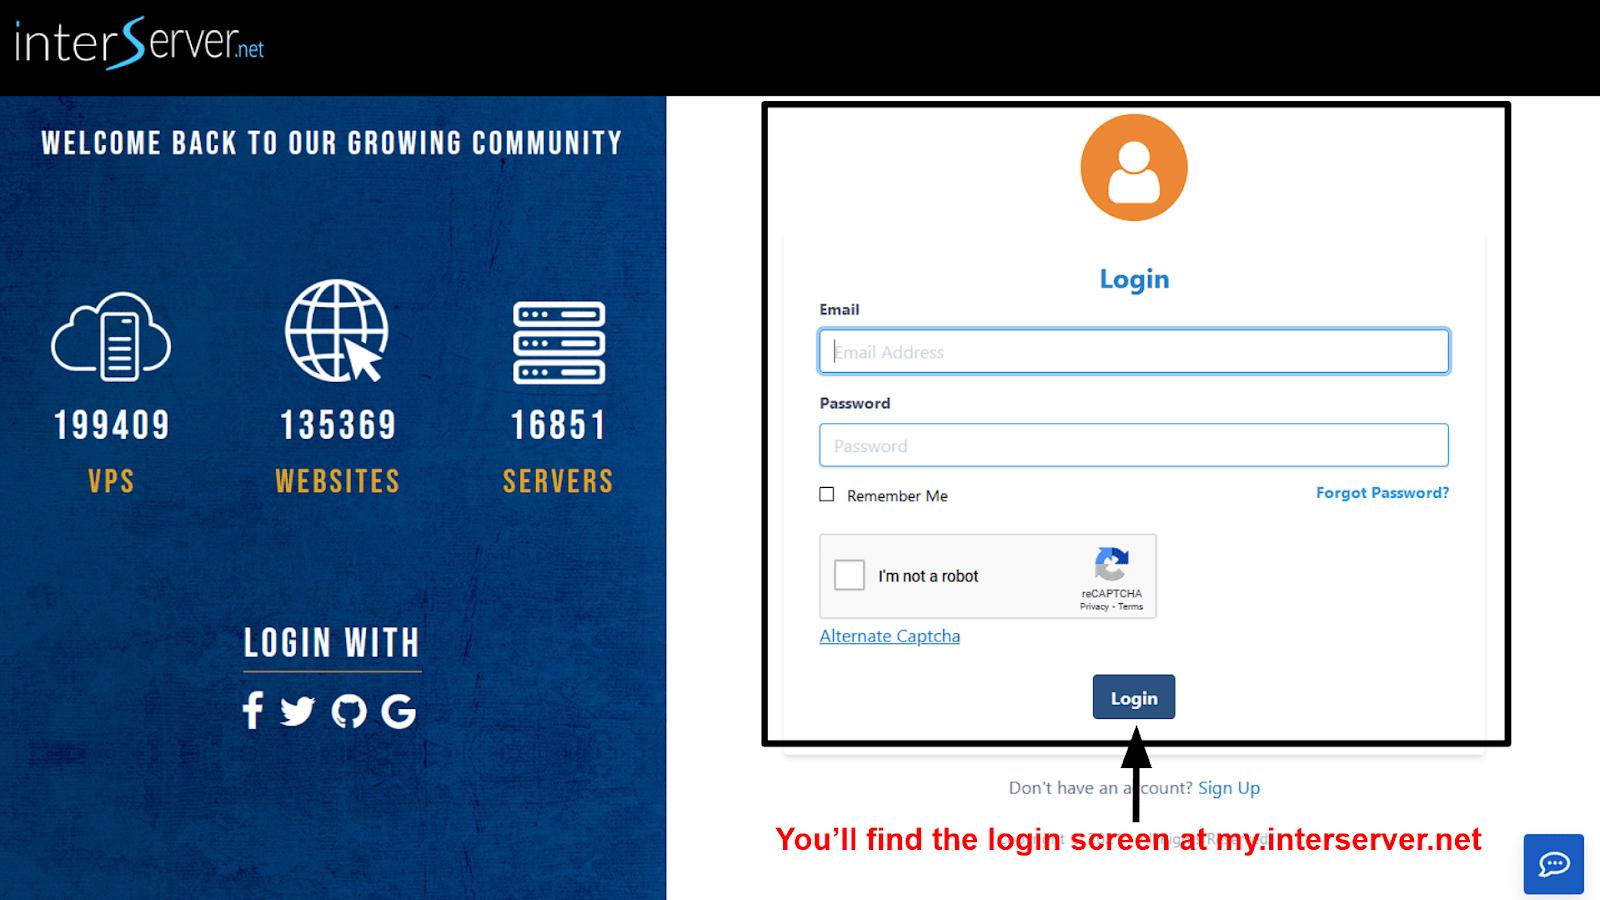 InterServer - login screen